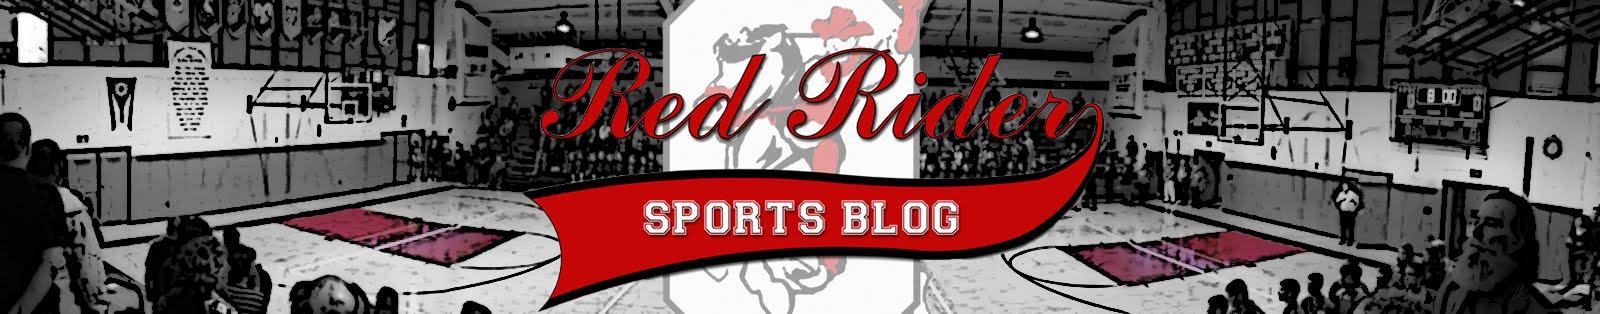 Orrville Red Rider Sports Blog